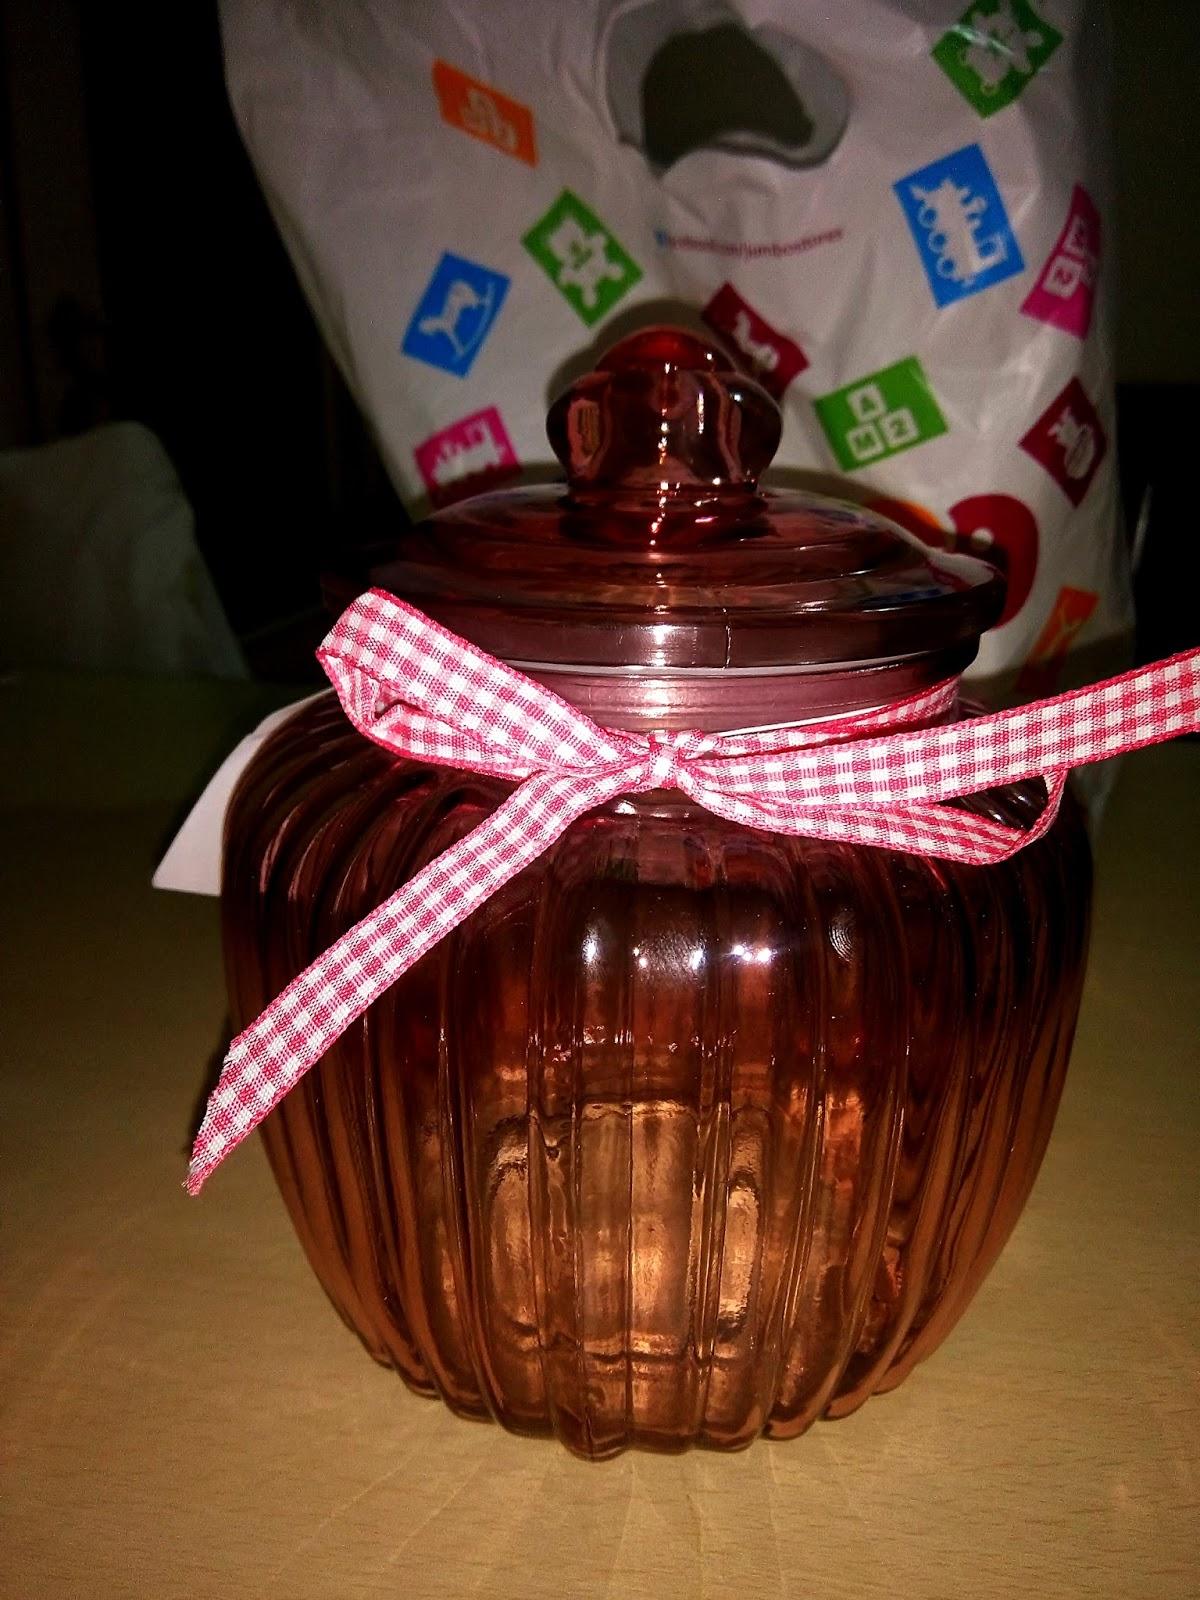 bb9d2eda561 Πήρα ως δώρο στη μητέρα μου αυτό το βάζο! Έχει τα 2 μικρότερα και βάζει  ζάχαρη και καφέ και επιδή της αρεσαν πάρα πολύ, της πήρα και το μεγάλο για  να ...